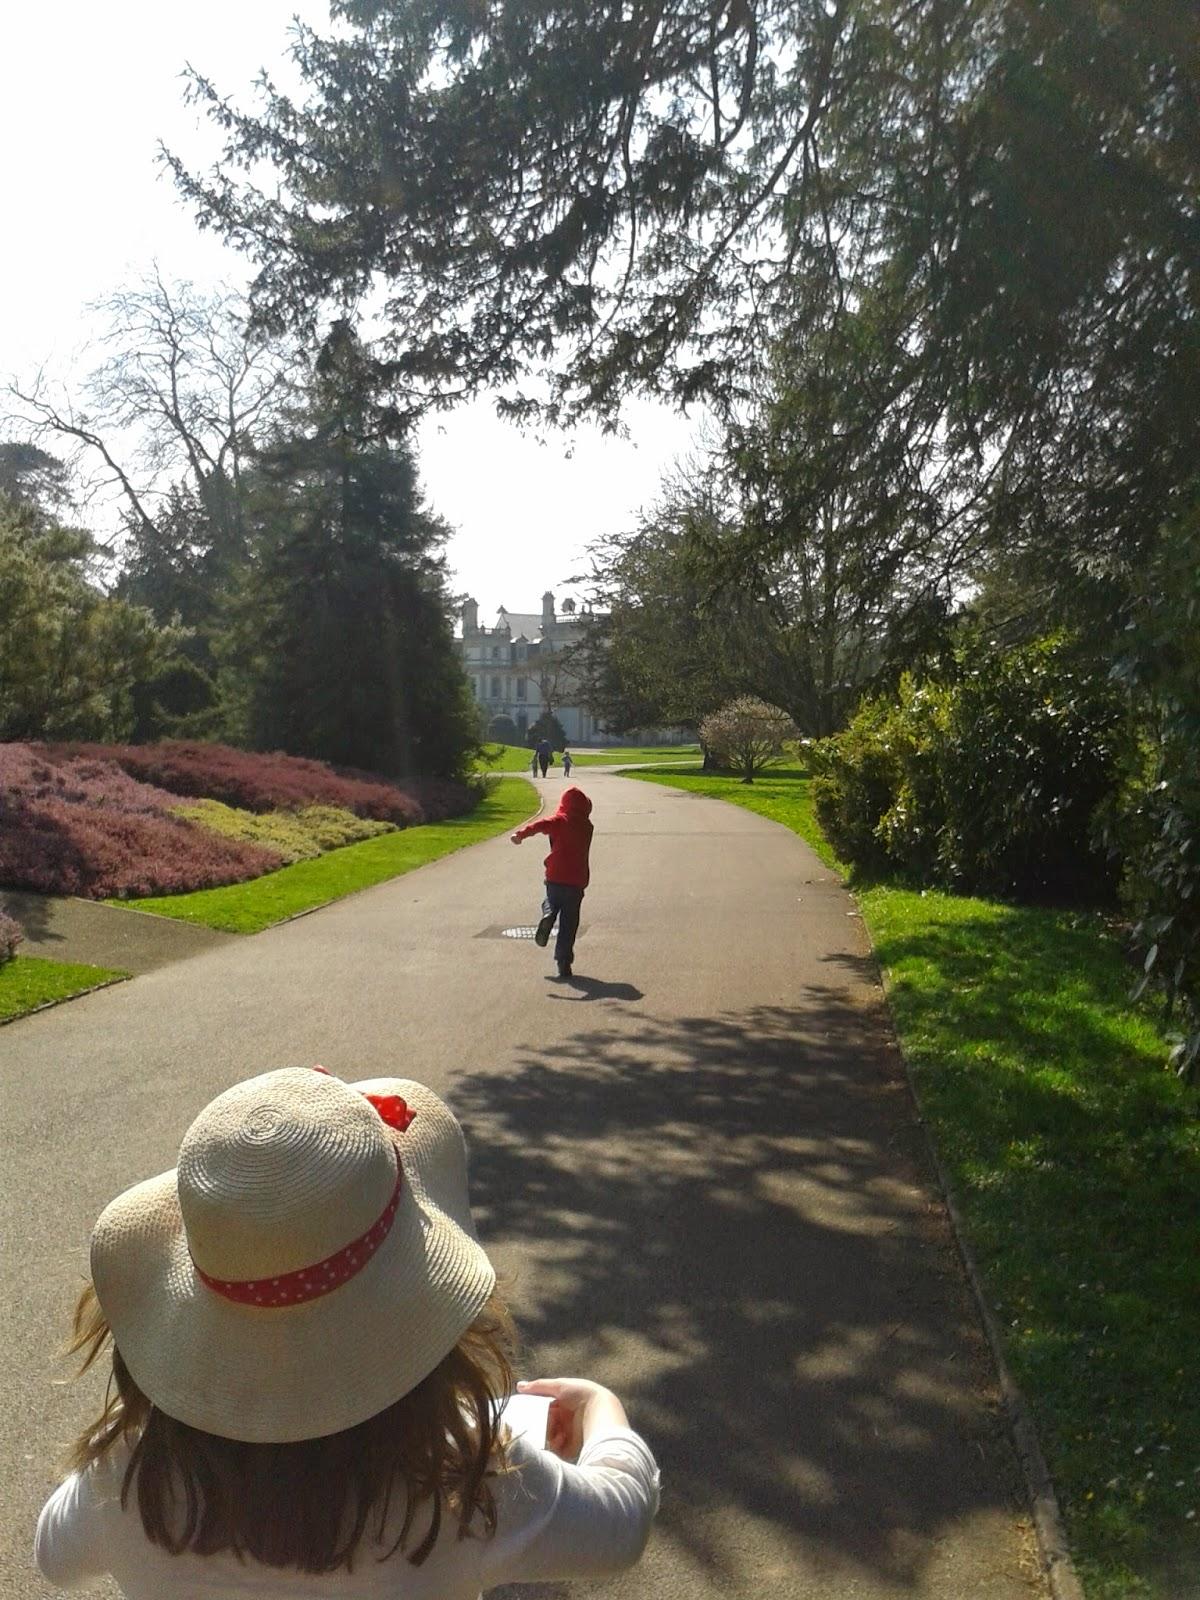 Caitlin & Ieuan running at Dyffryn Gardens